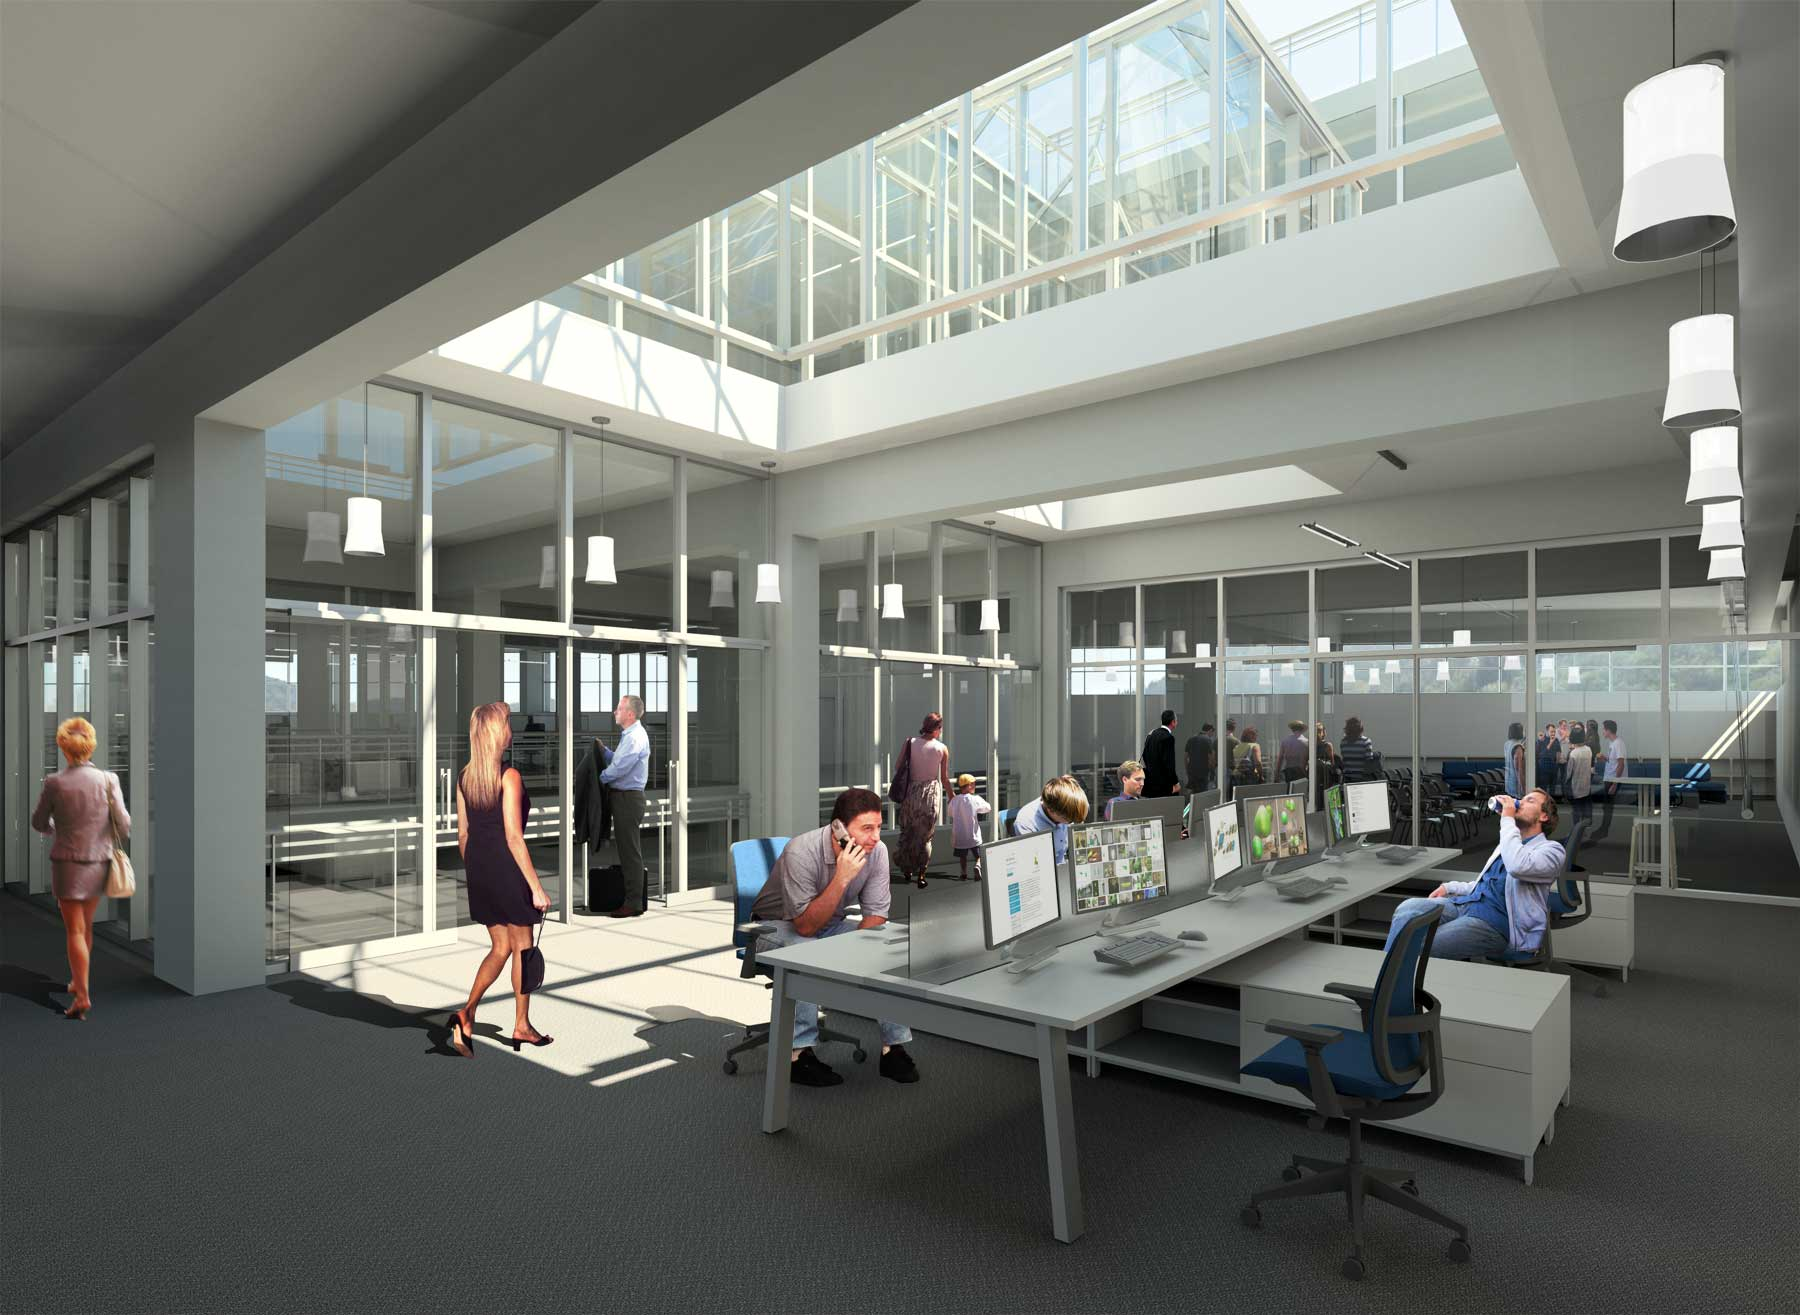 Training area for new staff or seasonal interns